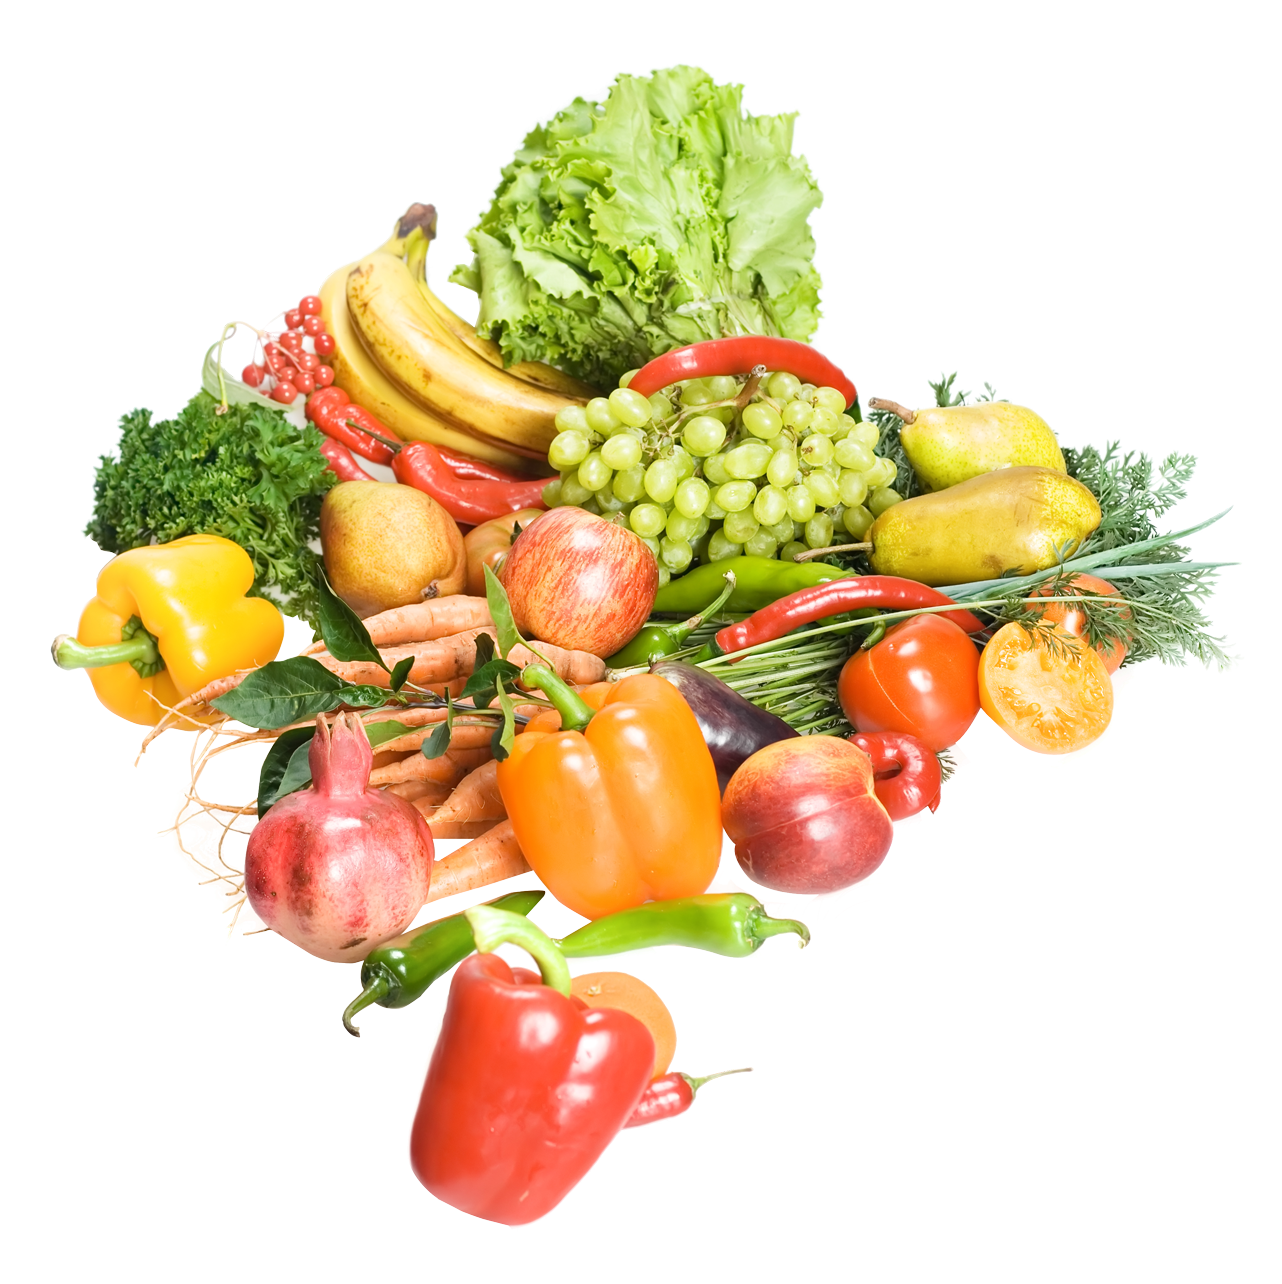 Fruits And Vegetables Png Image Vegetables Vegetable Platter Fruits And Vegetables